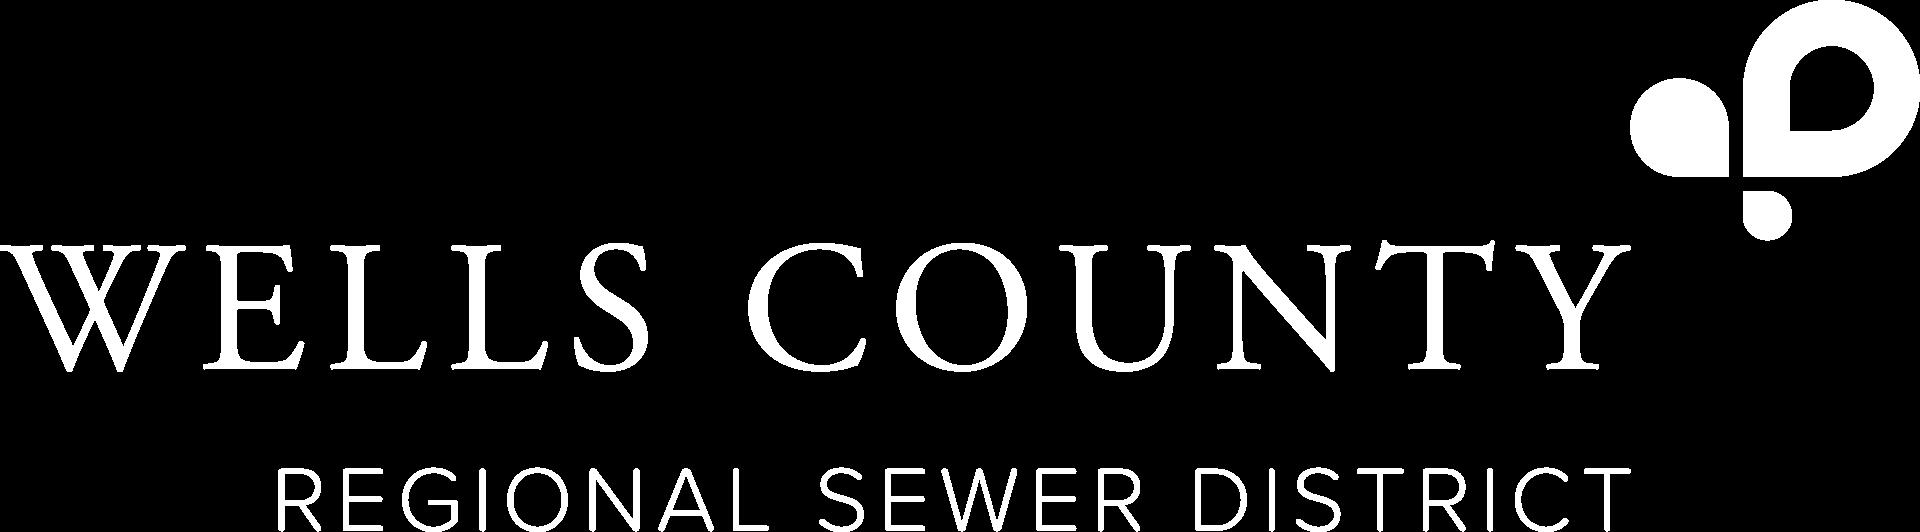 Wells County RSD